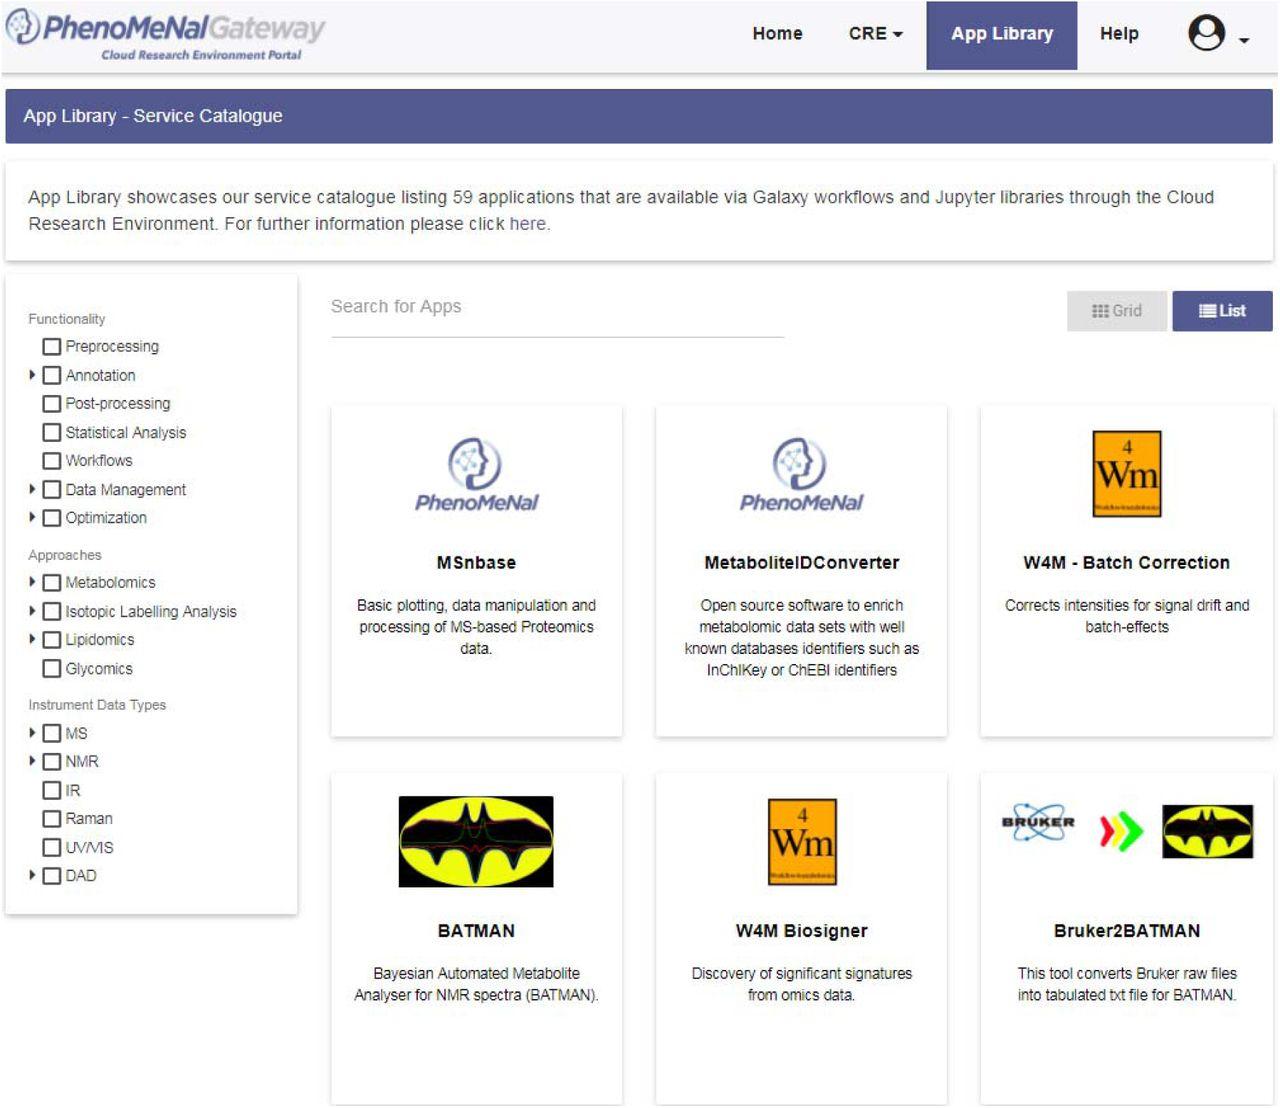 PhenoMeNal: Processing and analysis of Metabolomics data in